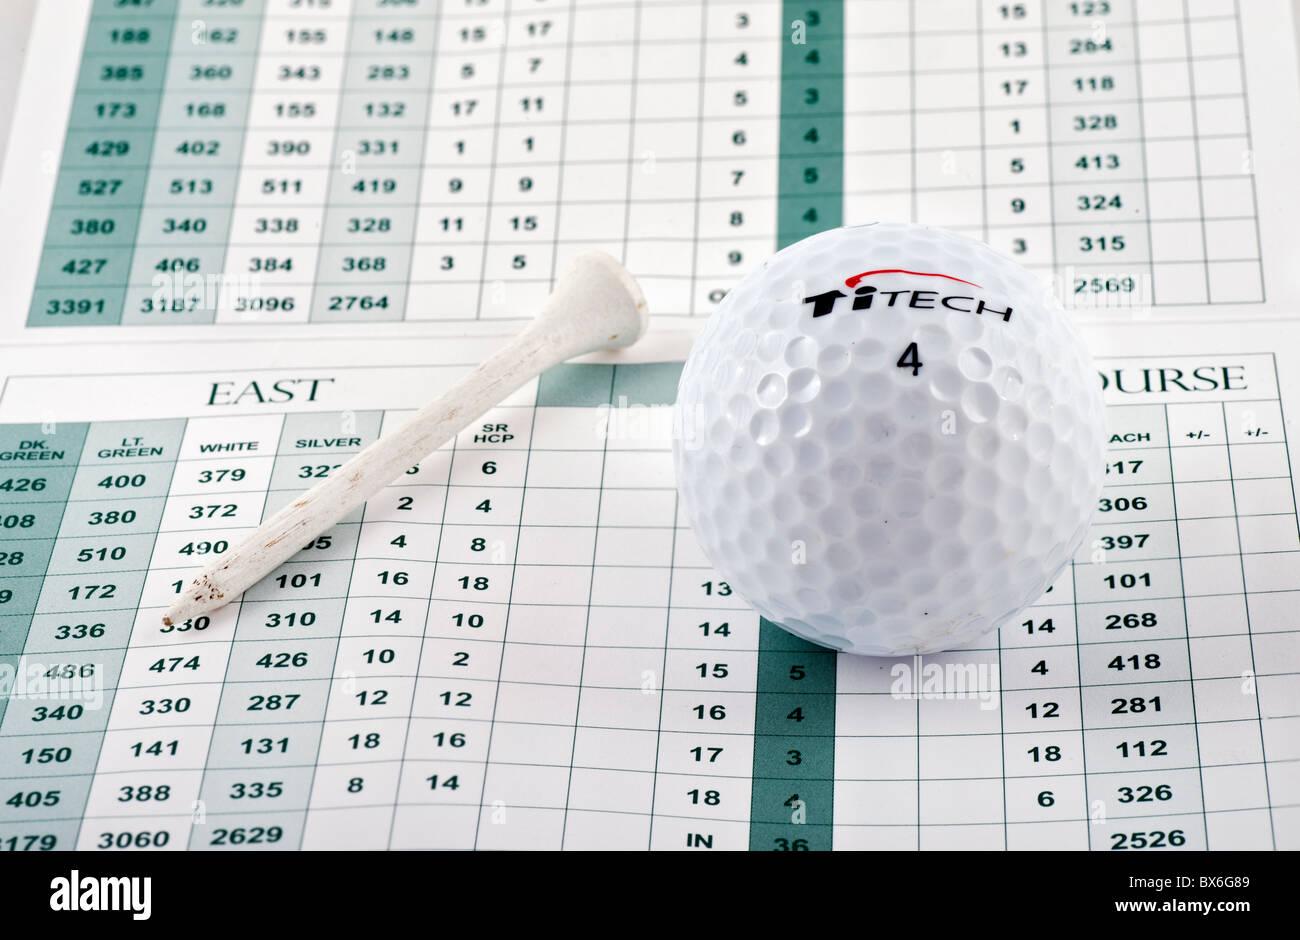 Golfball, Tee und Score Card, Florida, USA Stockbild